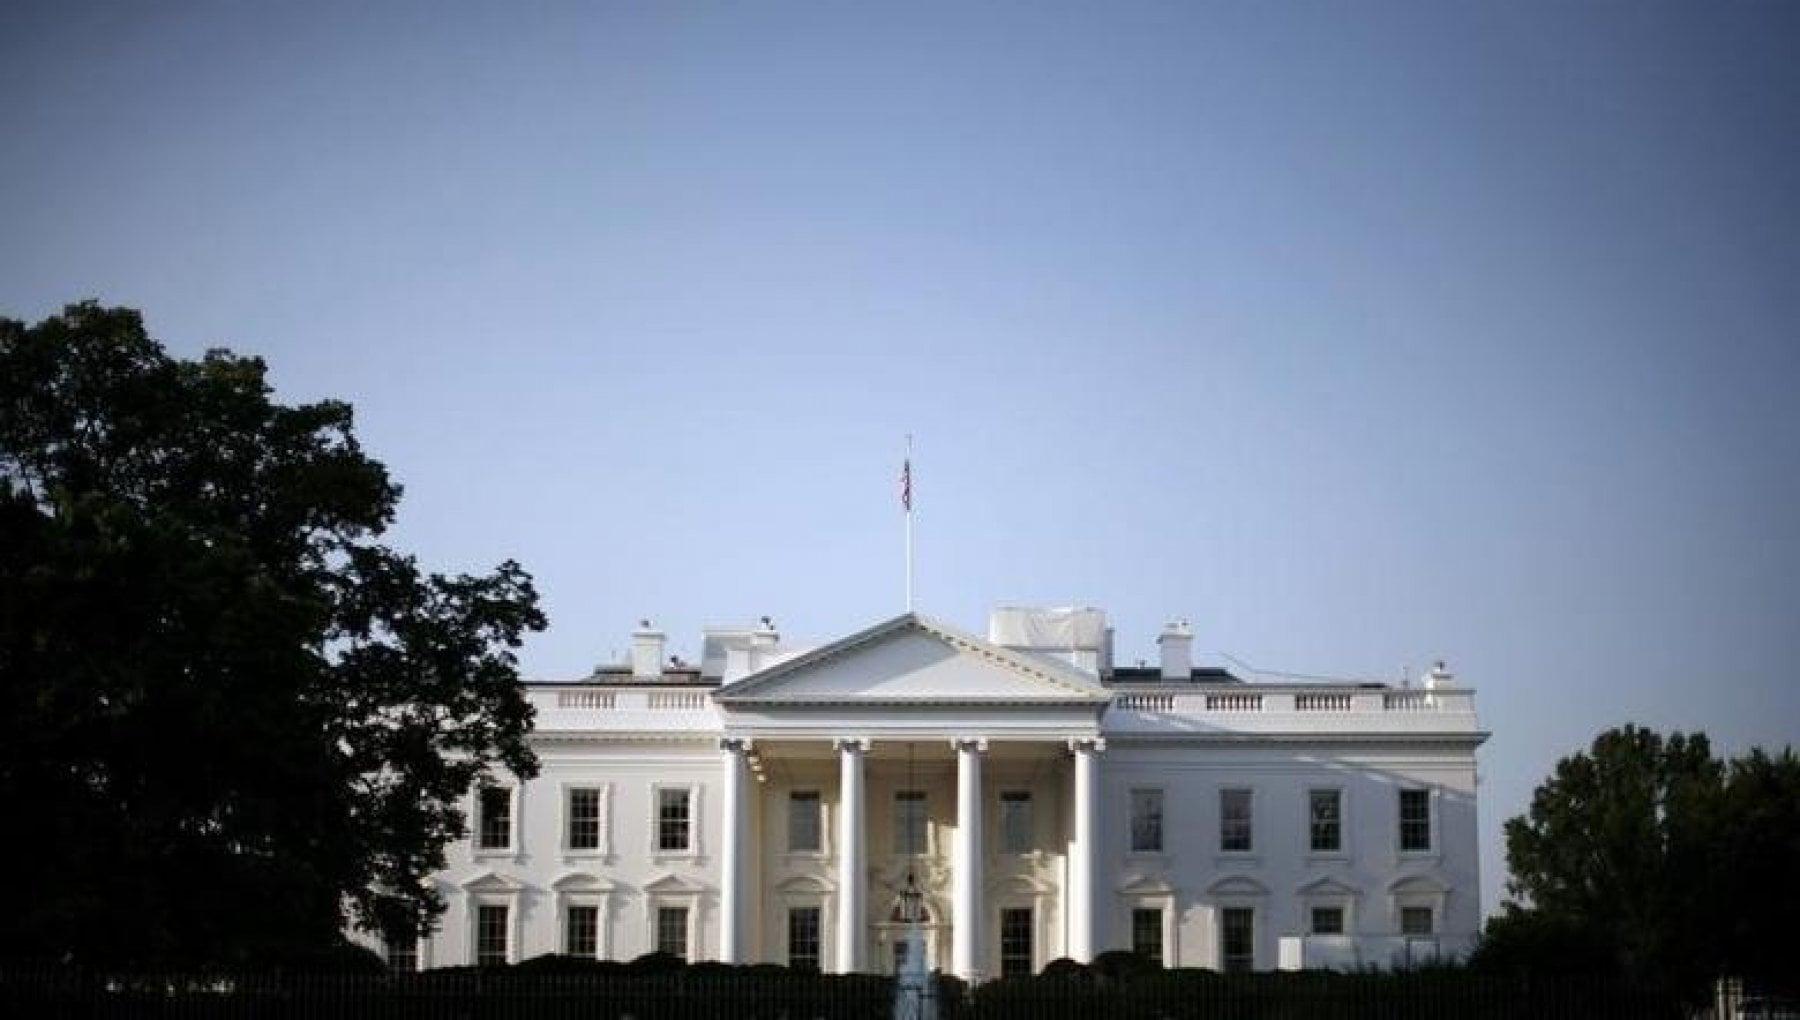 031227330 23ac97d5 59b2 4459 b911 b46f2f34697c - Biden invita il presidente ucraino alla Casa Bianca